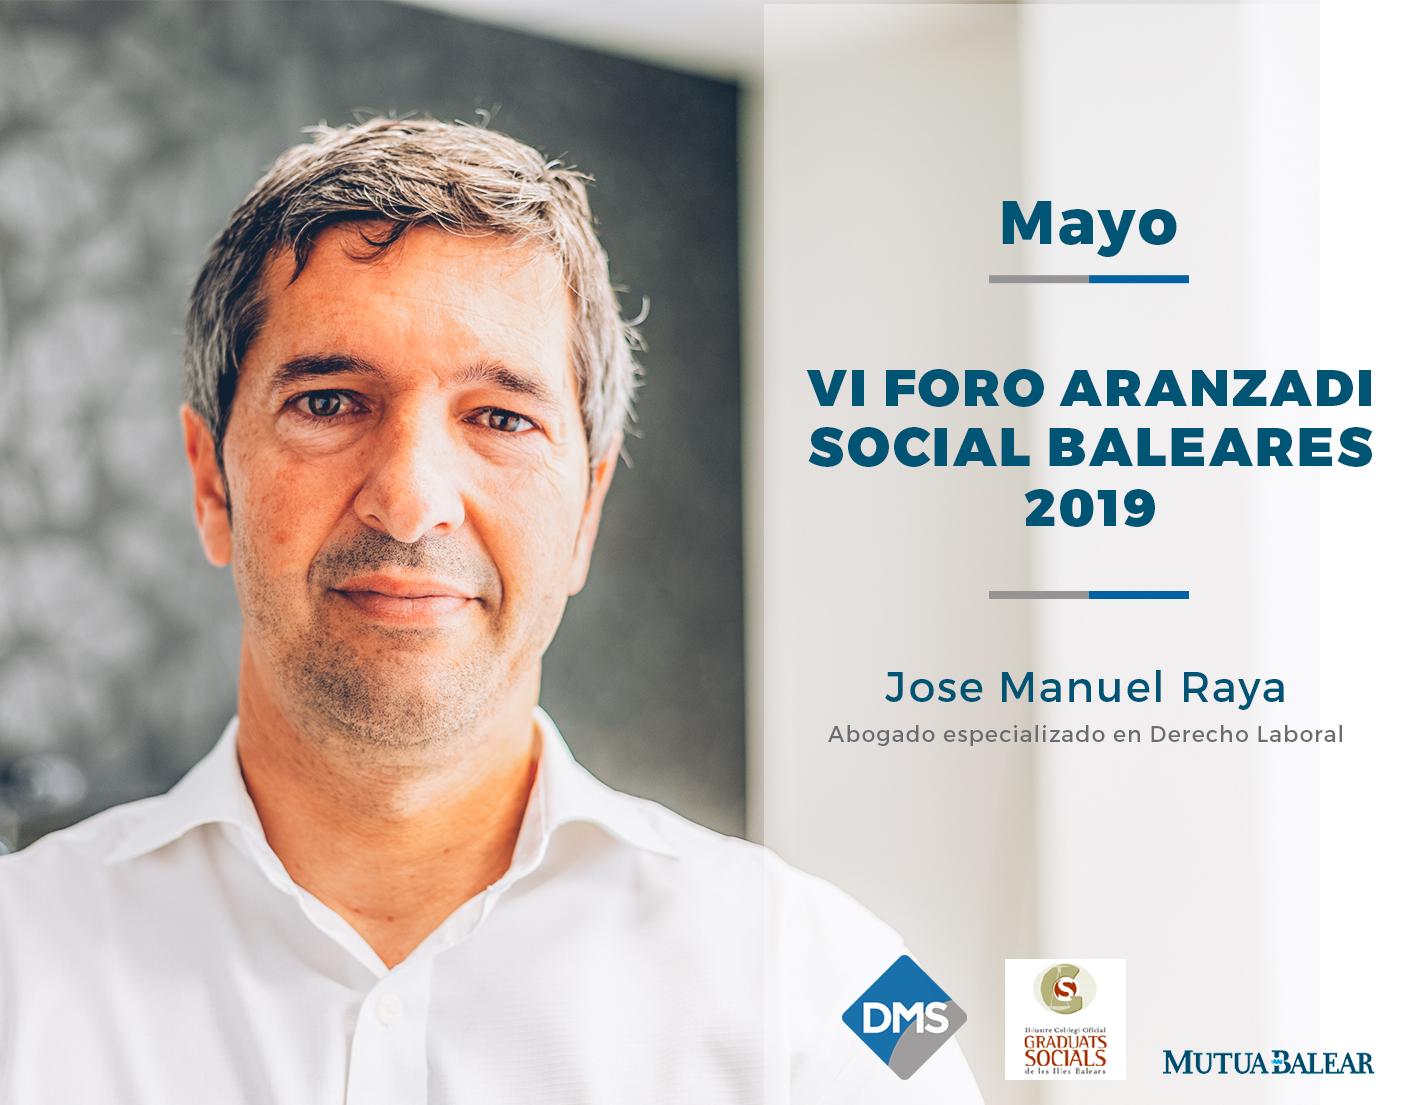 Jose Manuel Raya colabora en el prestigioso VI Foro Aranzadi Social Baleares